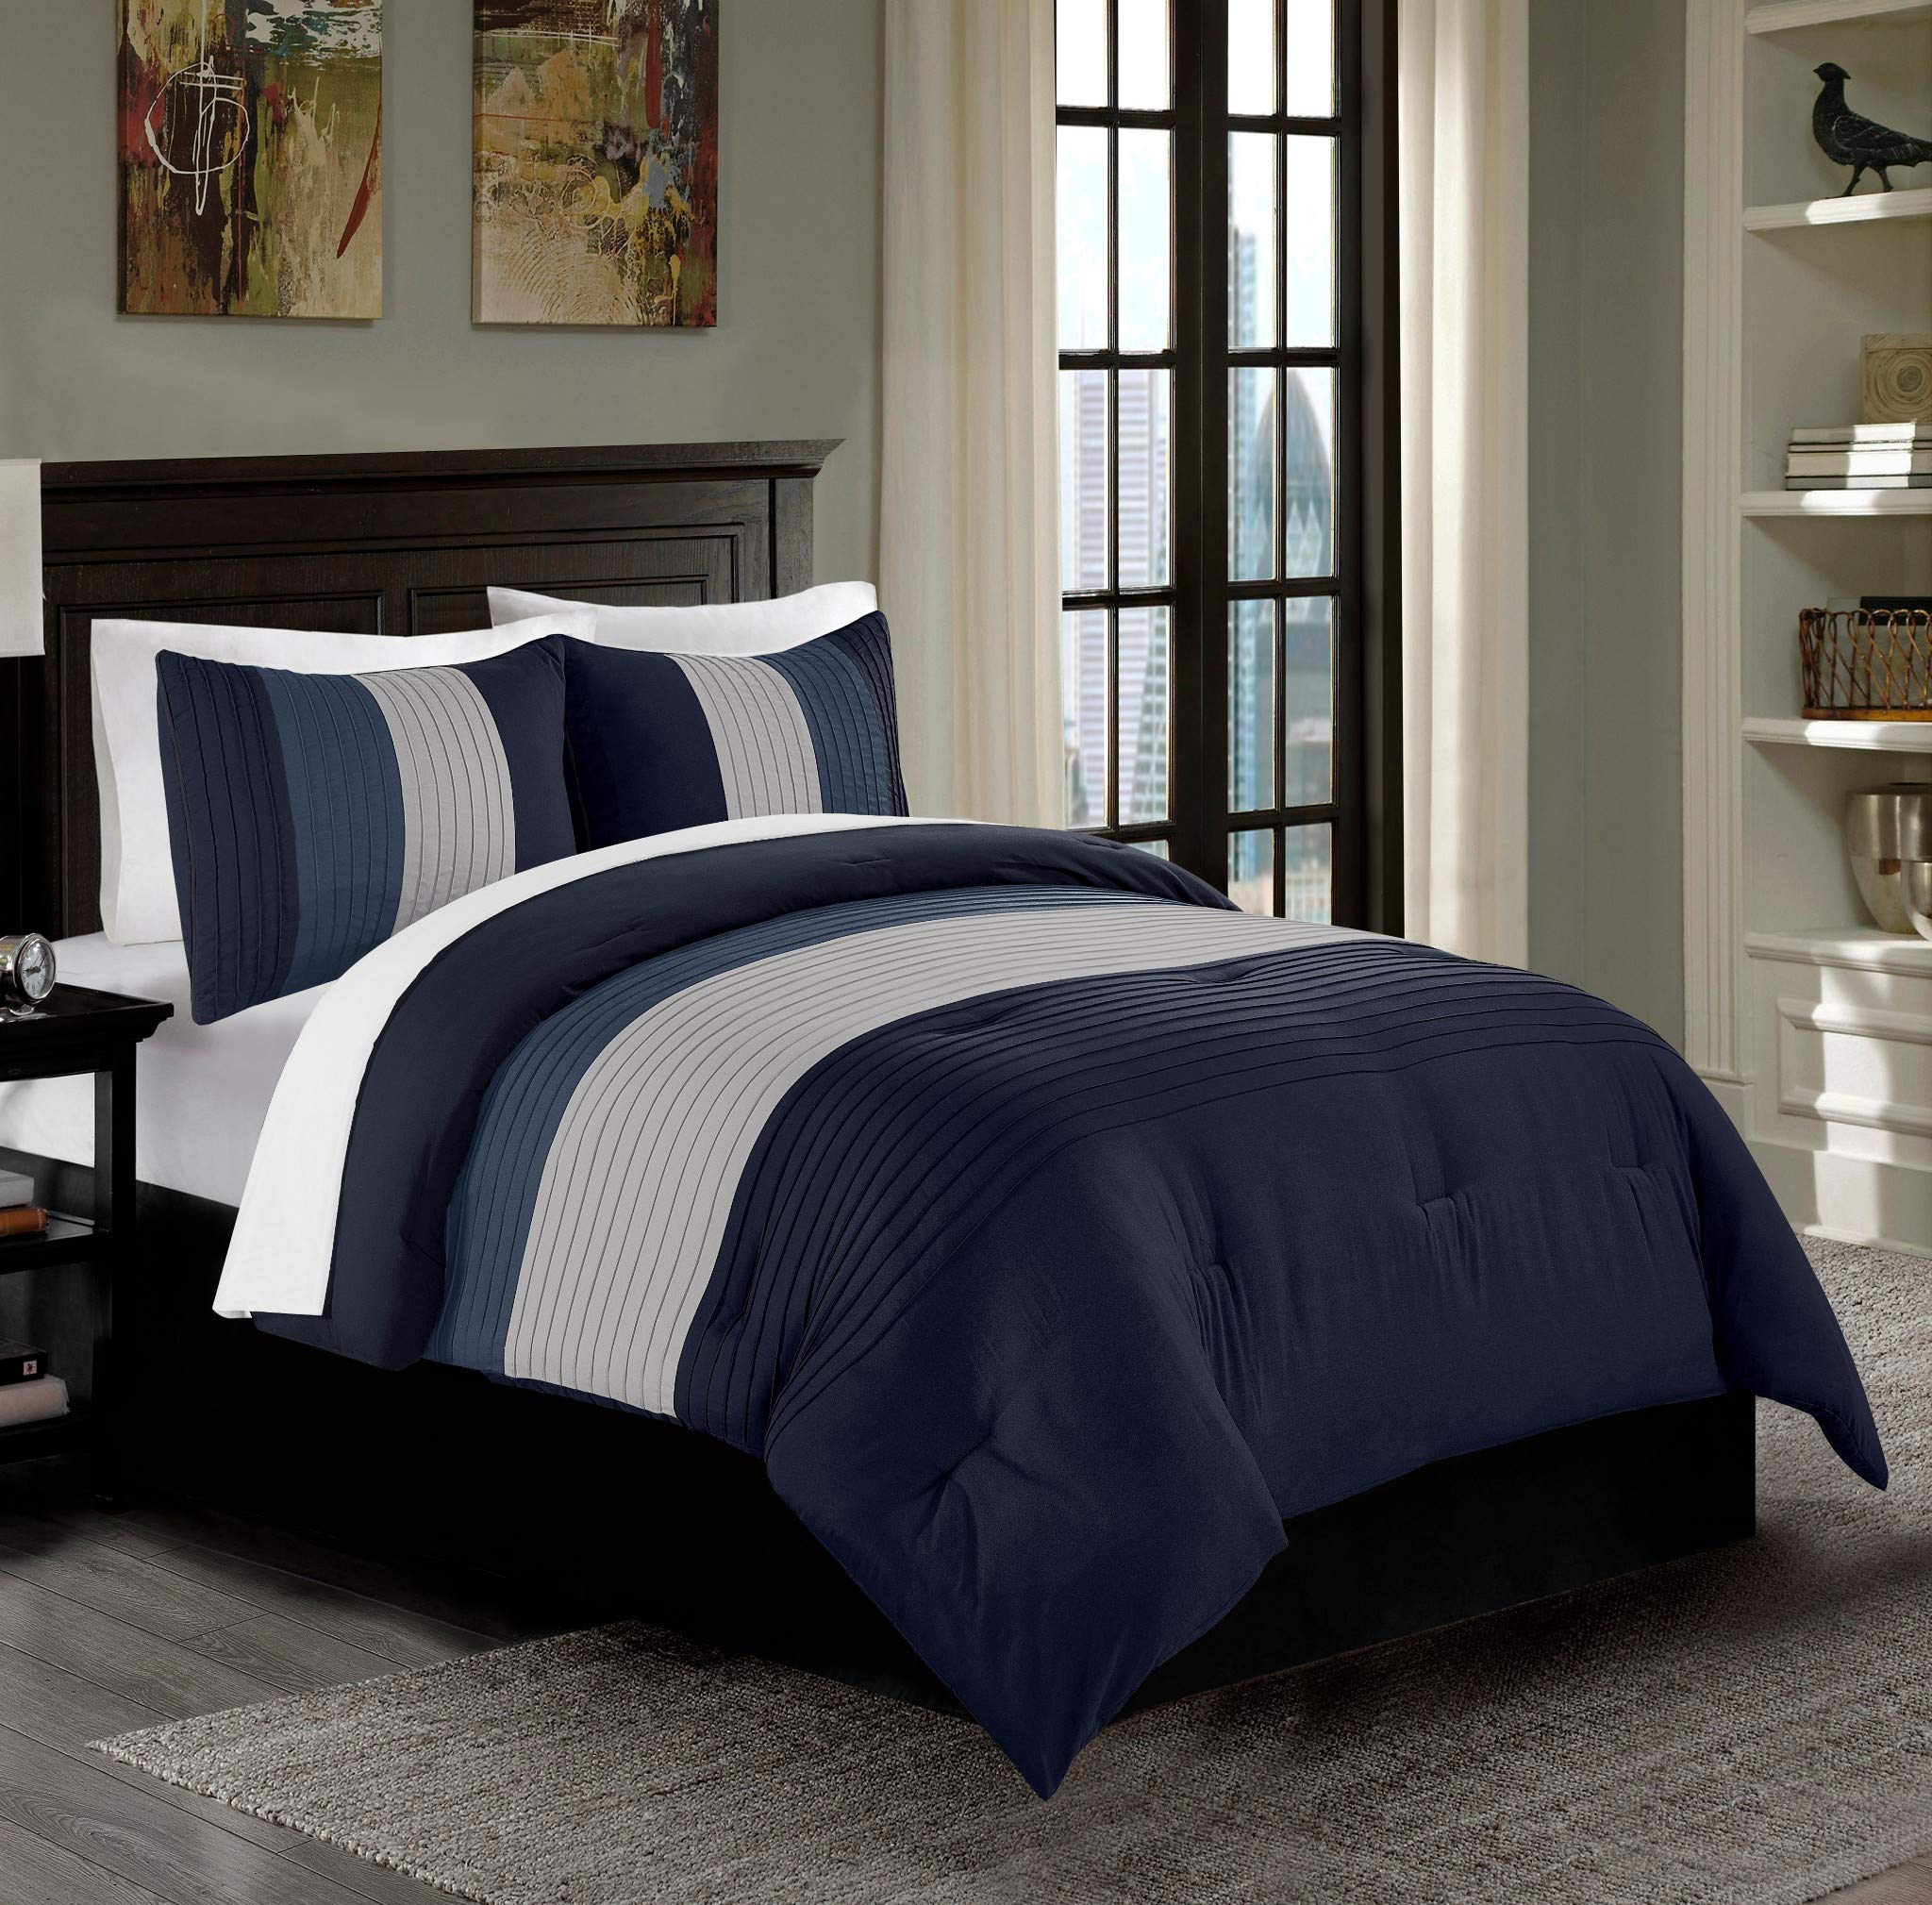 Chezmoi Collection Harper 3-Piece Luxury Striped Pleated Bedding Comforter Set